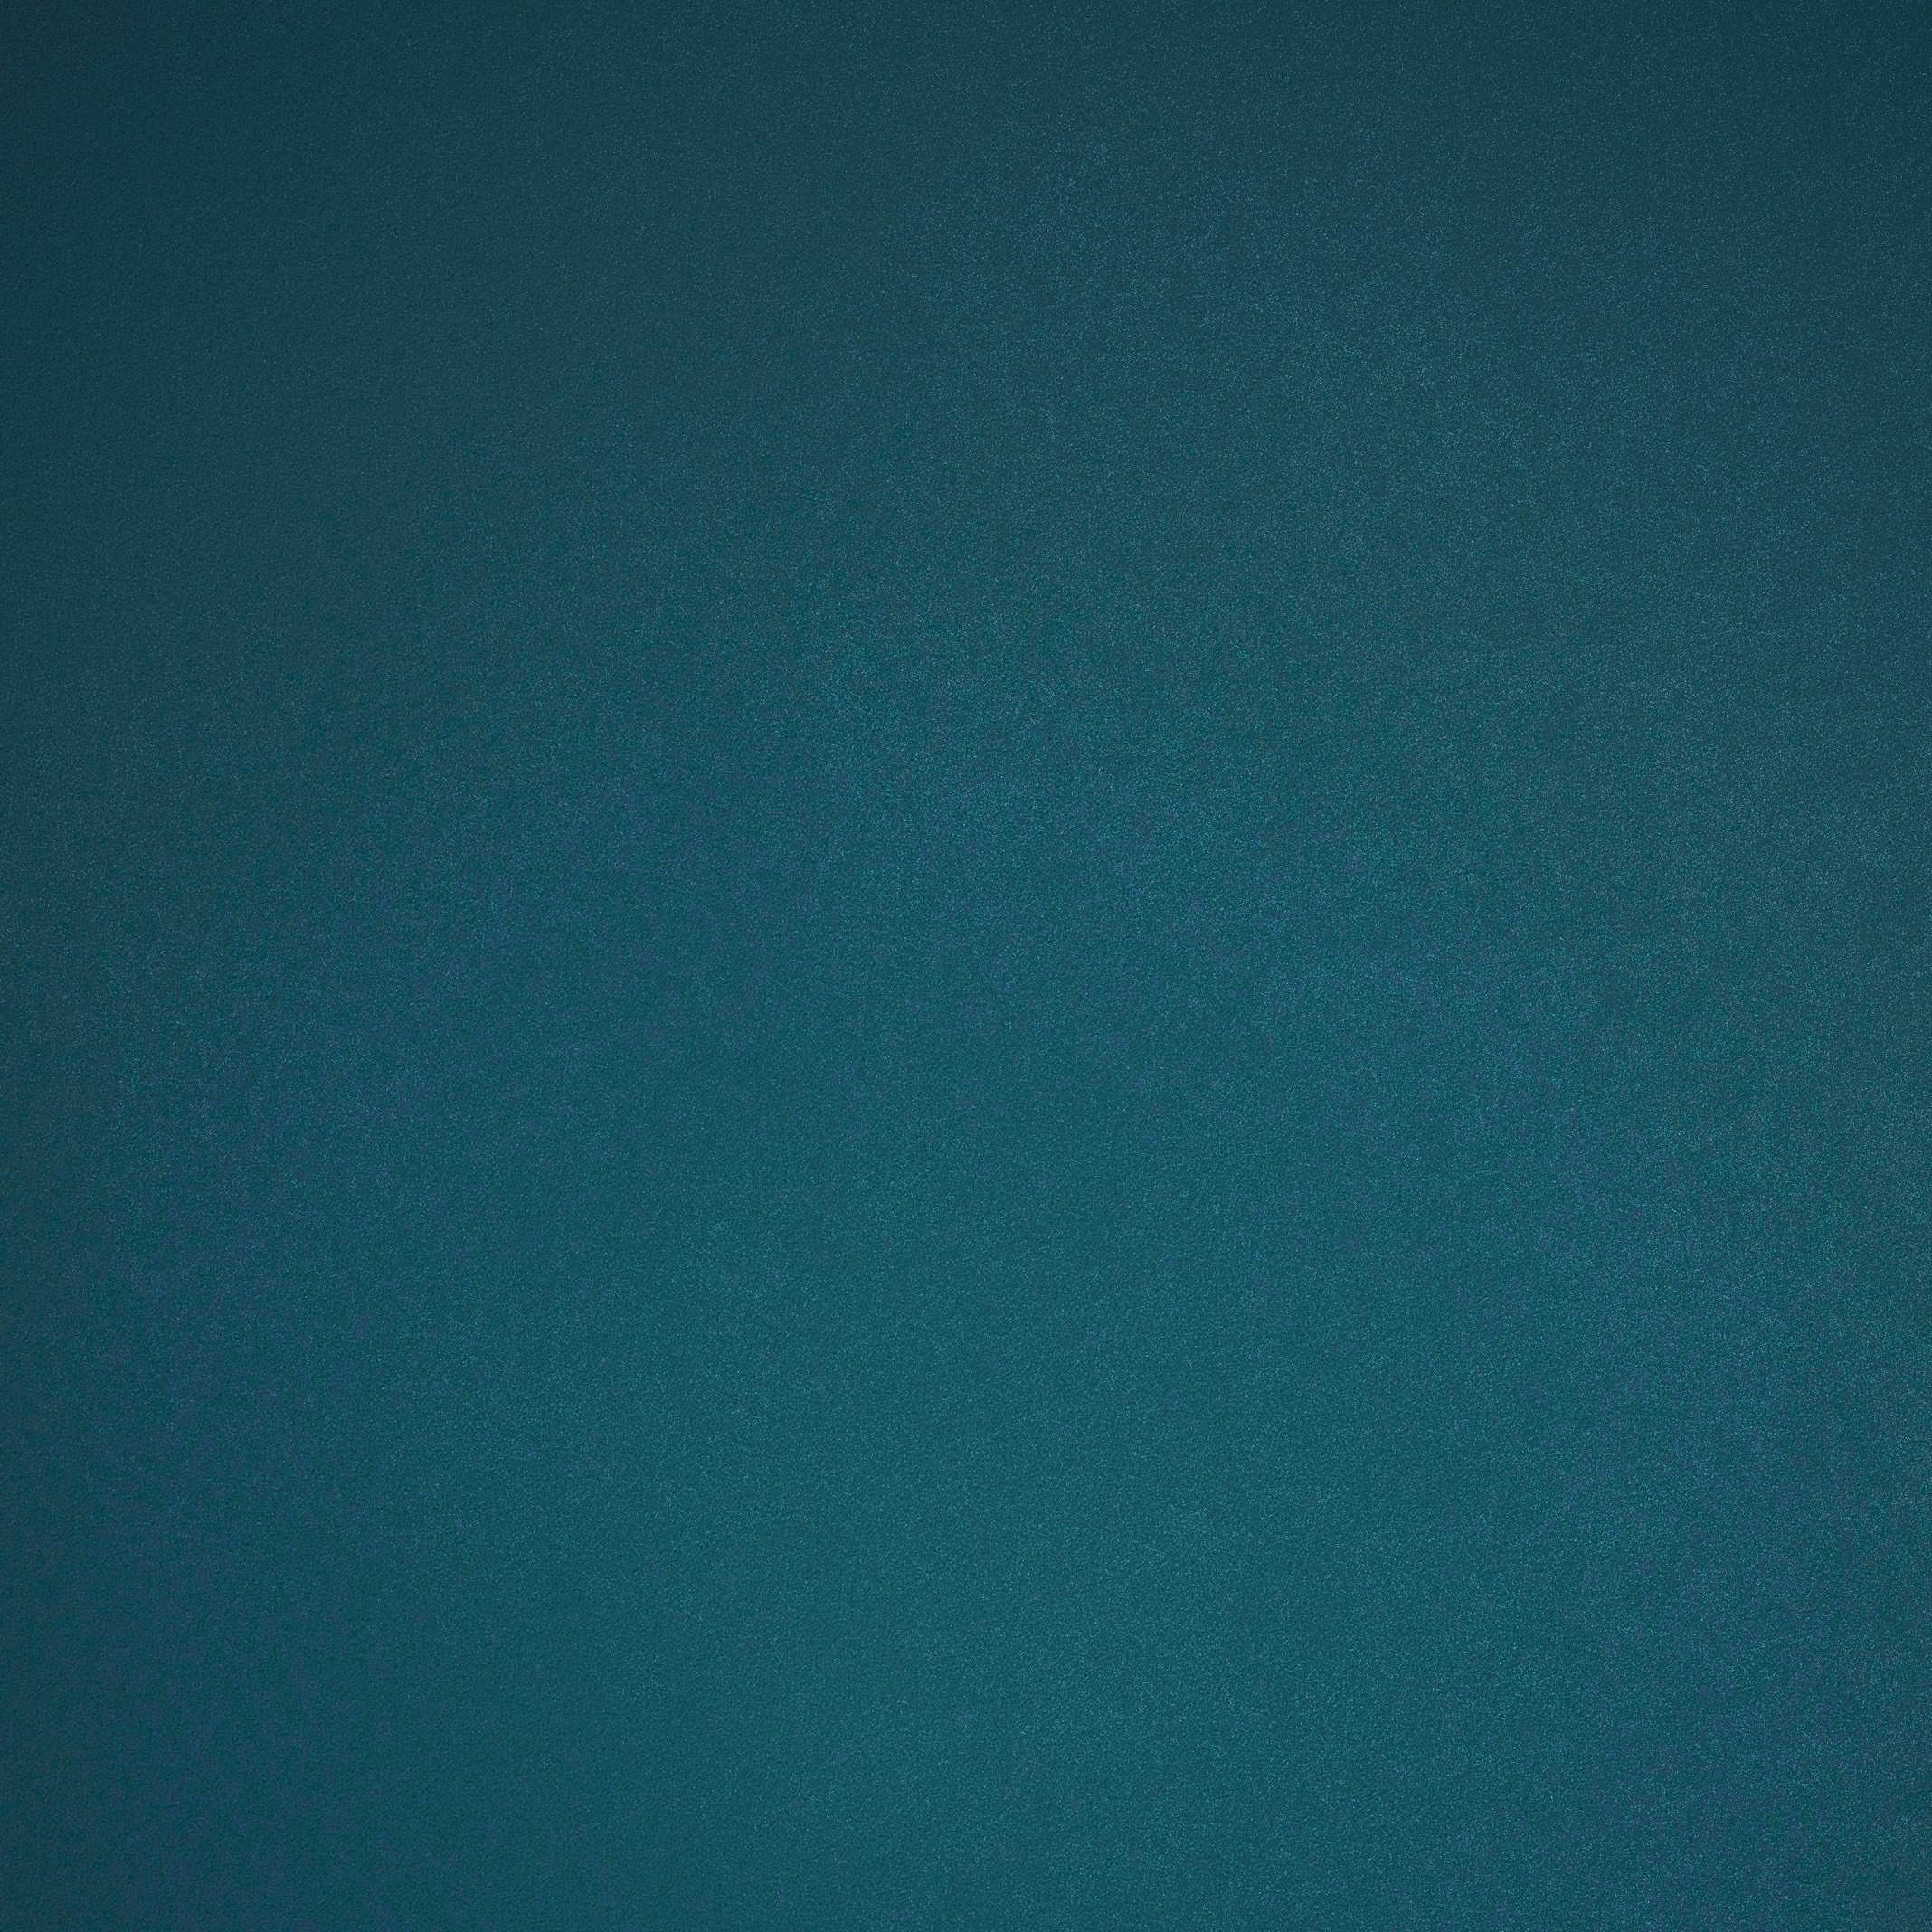 Light Blue And Beige Living Room: Light Blue Green Wallpaper (72+ Images